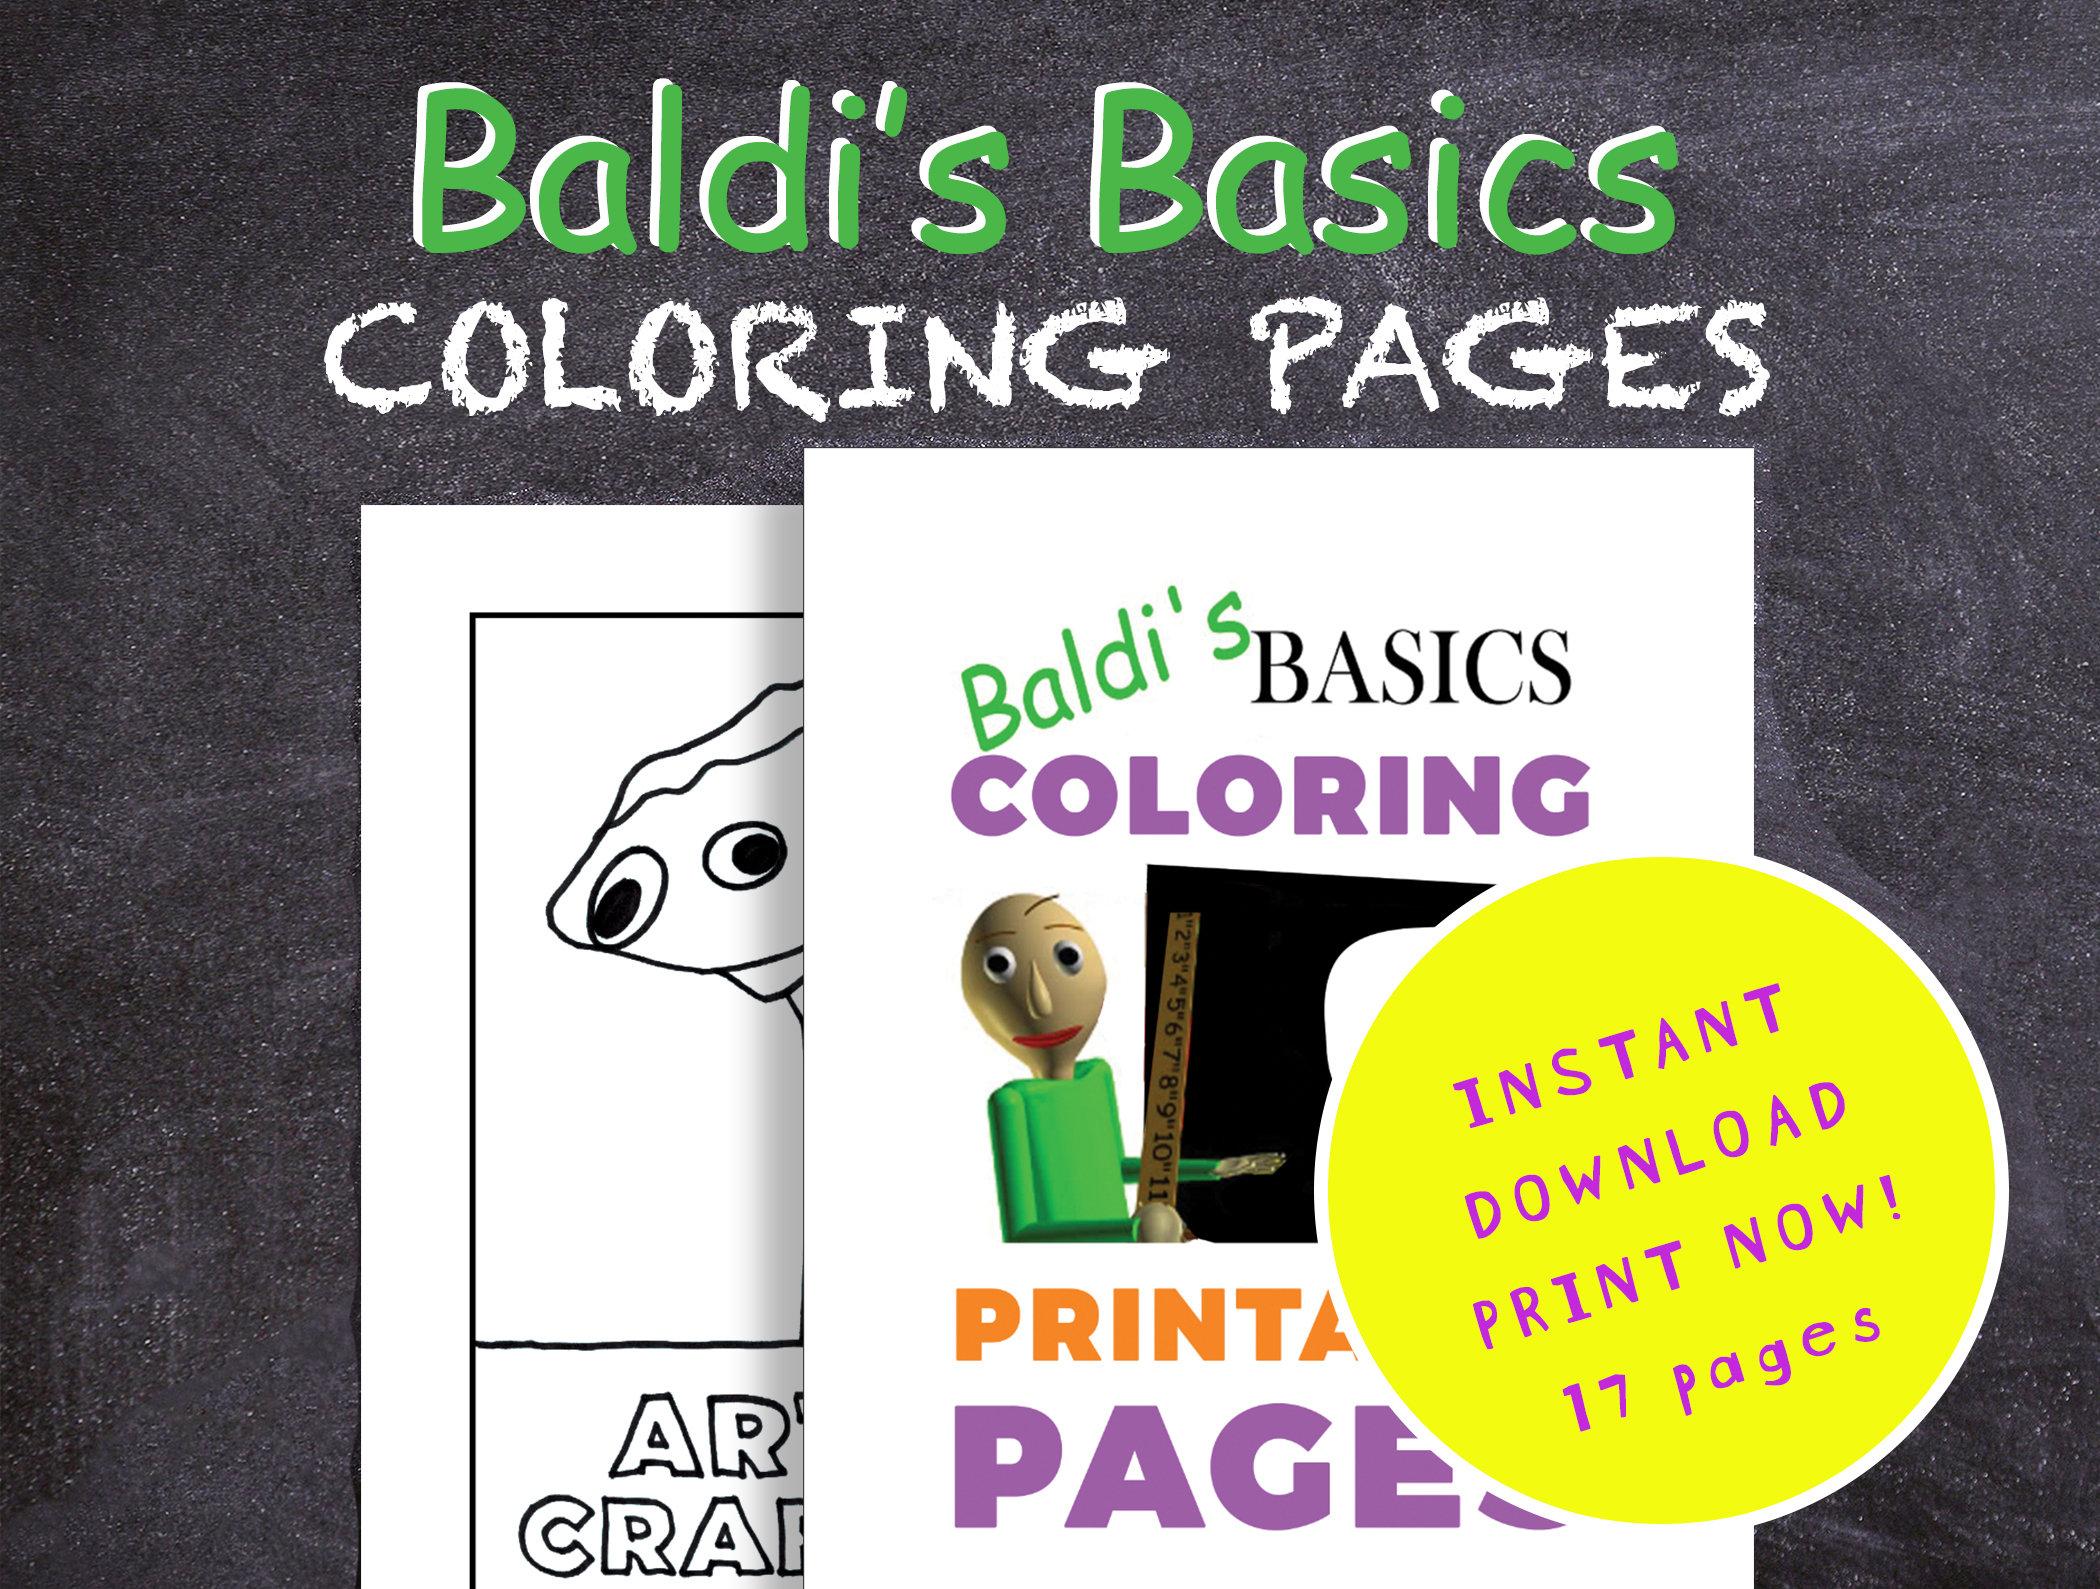 Baldis Basics Coloring Pages Printable Pdf Digital Etsy